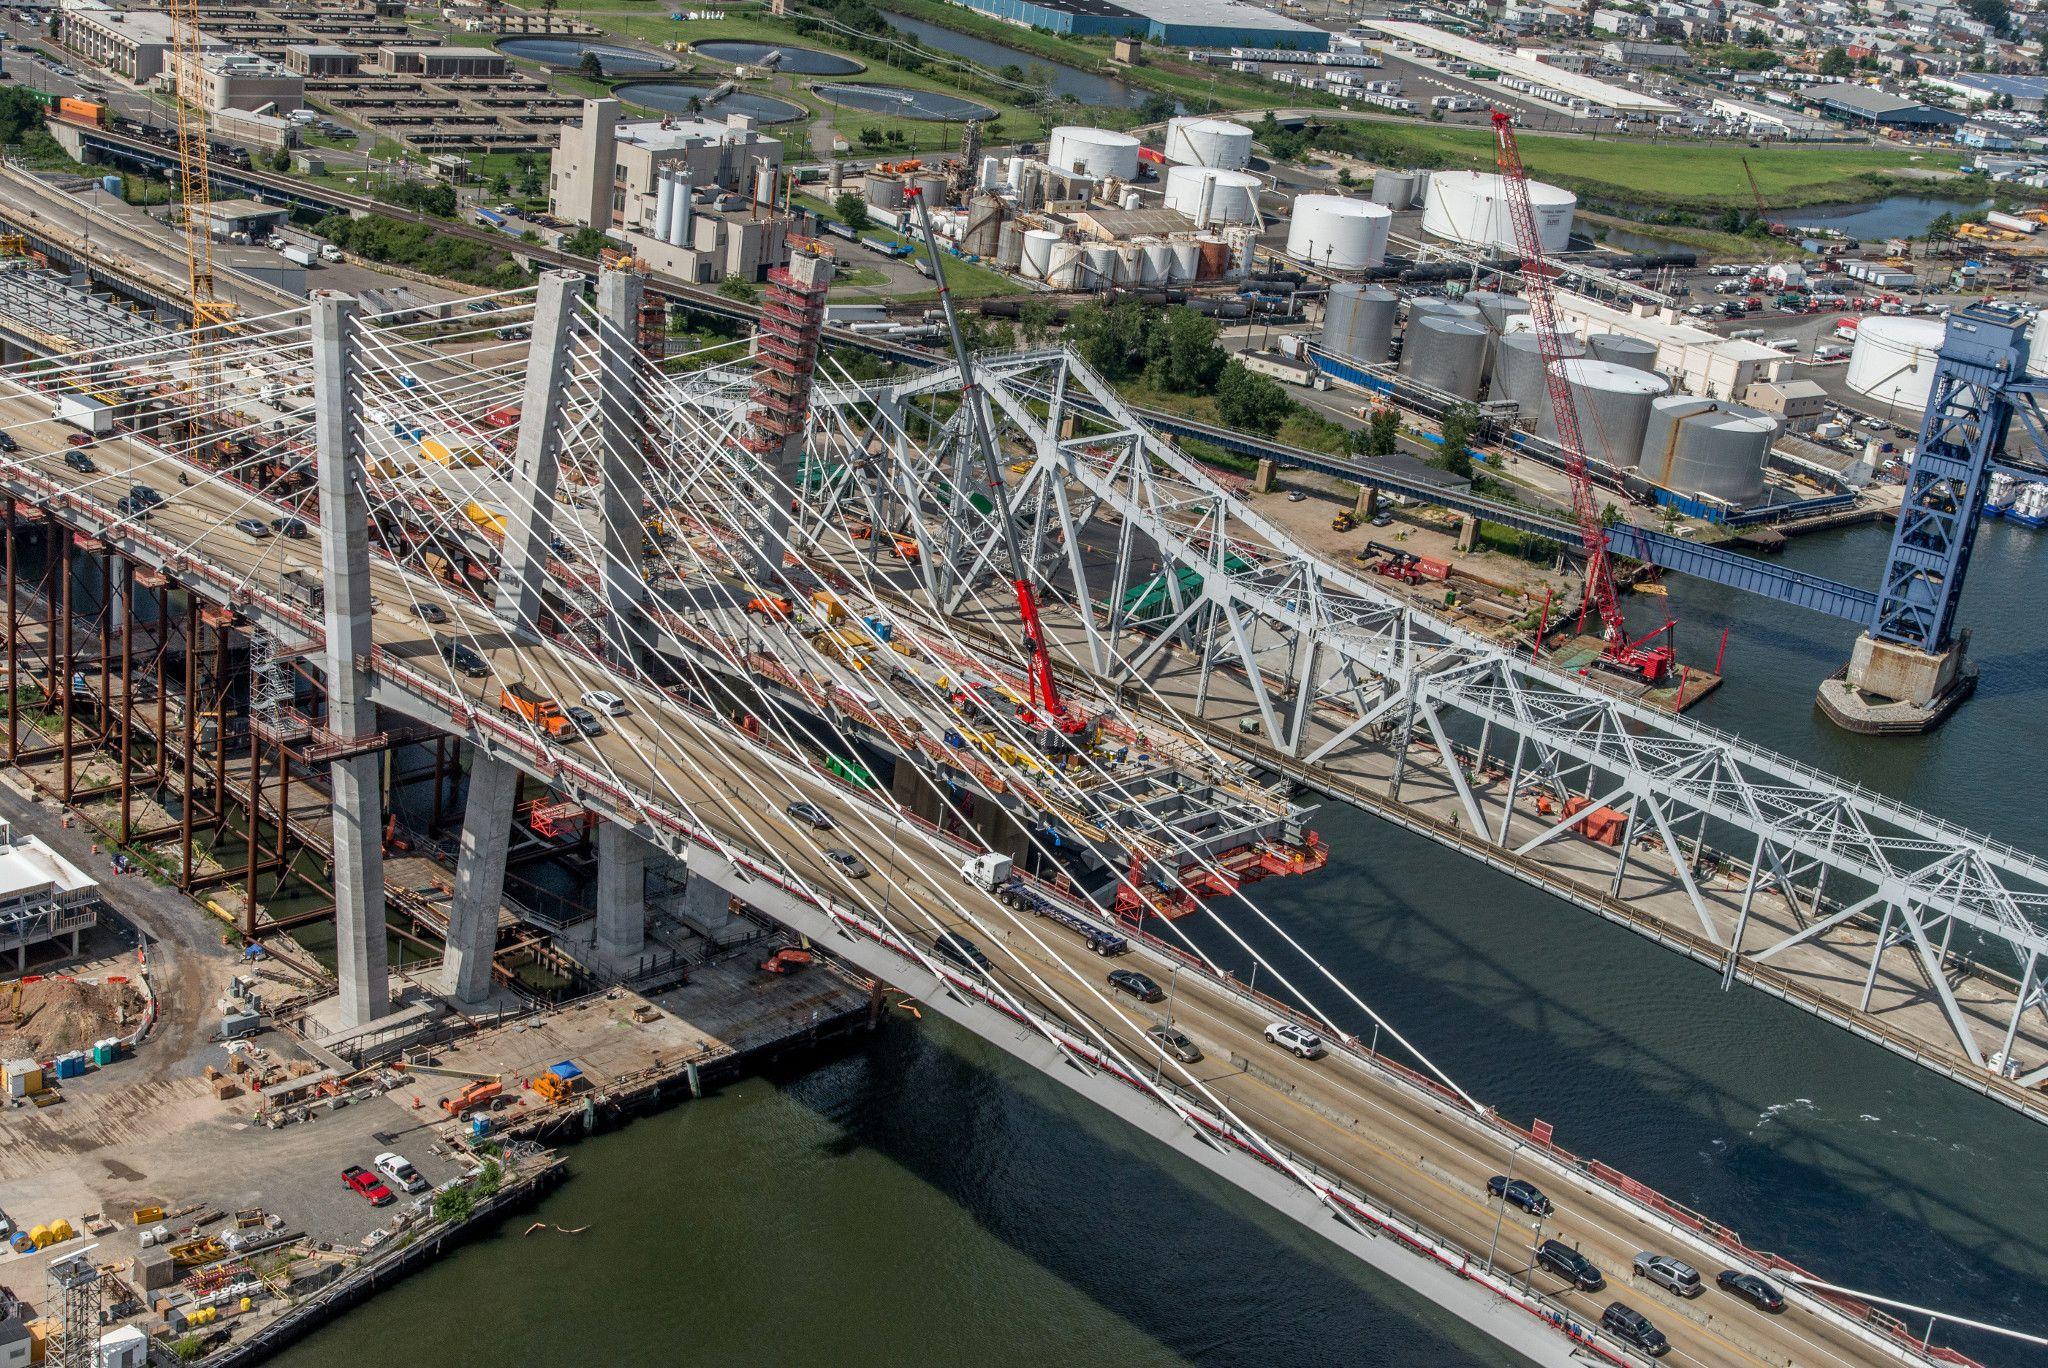 Goethals Bridge Replacement